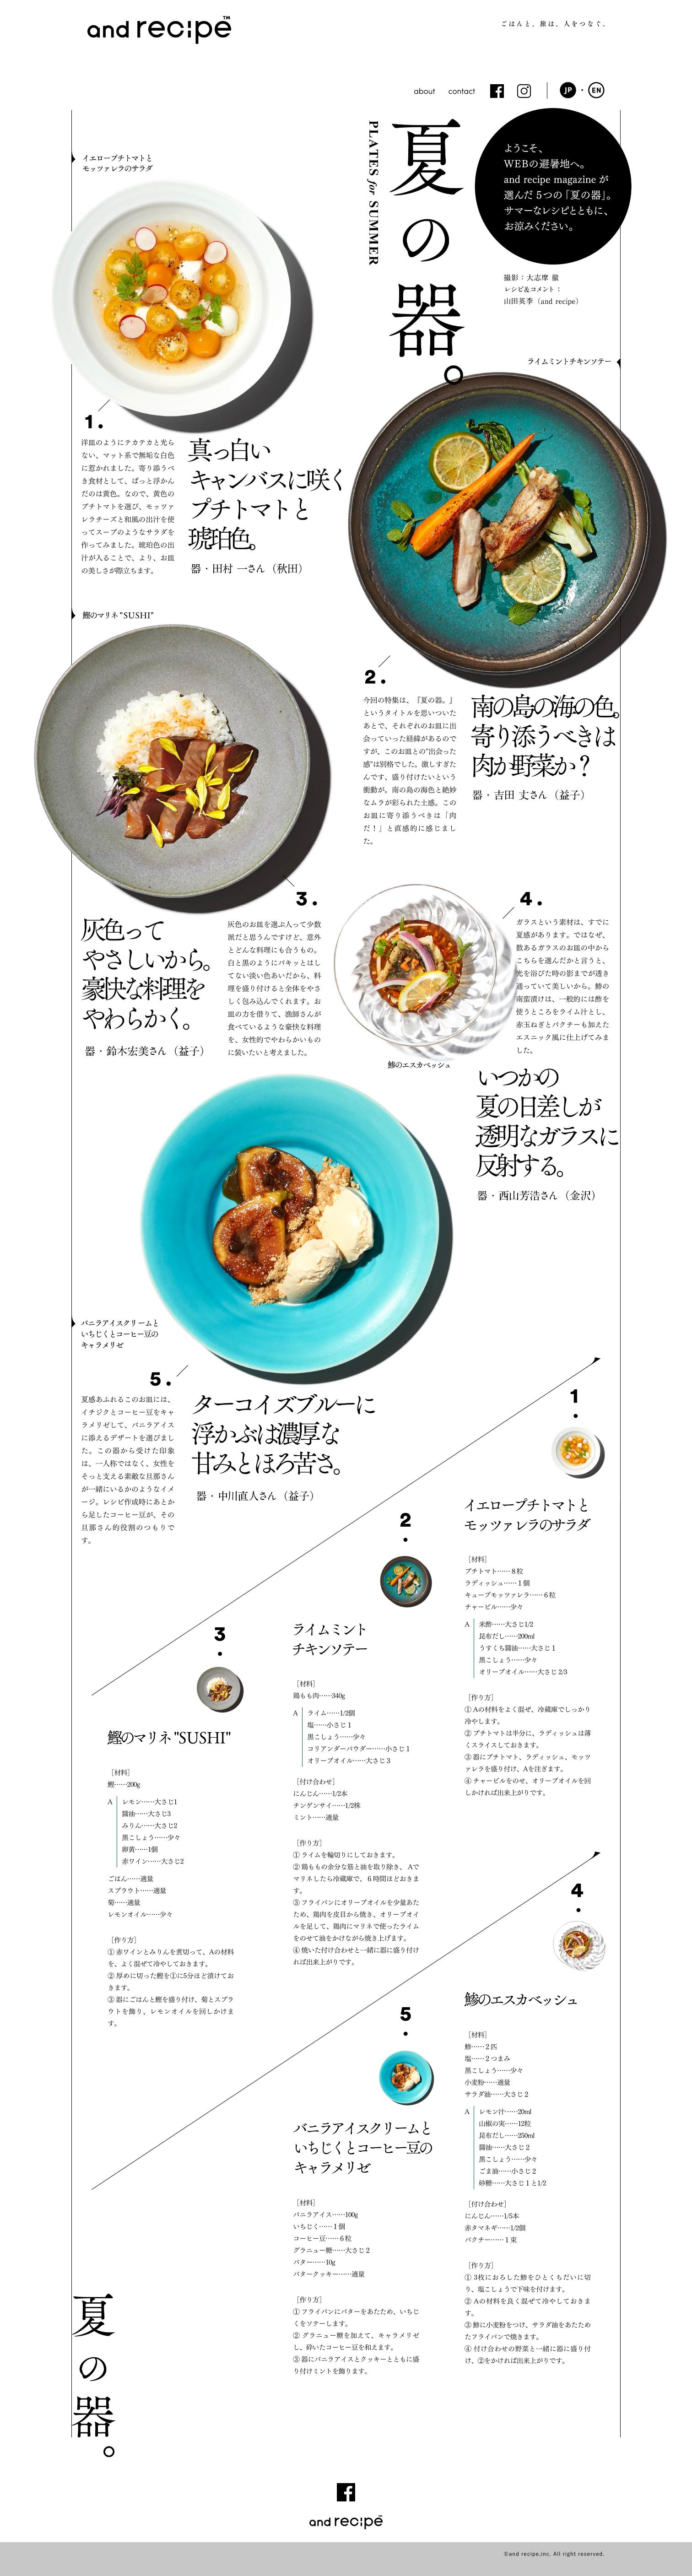 [and recipe] web magazine  |  夏の器。  キタダデザイン http://kitada-design.com/